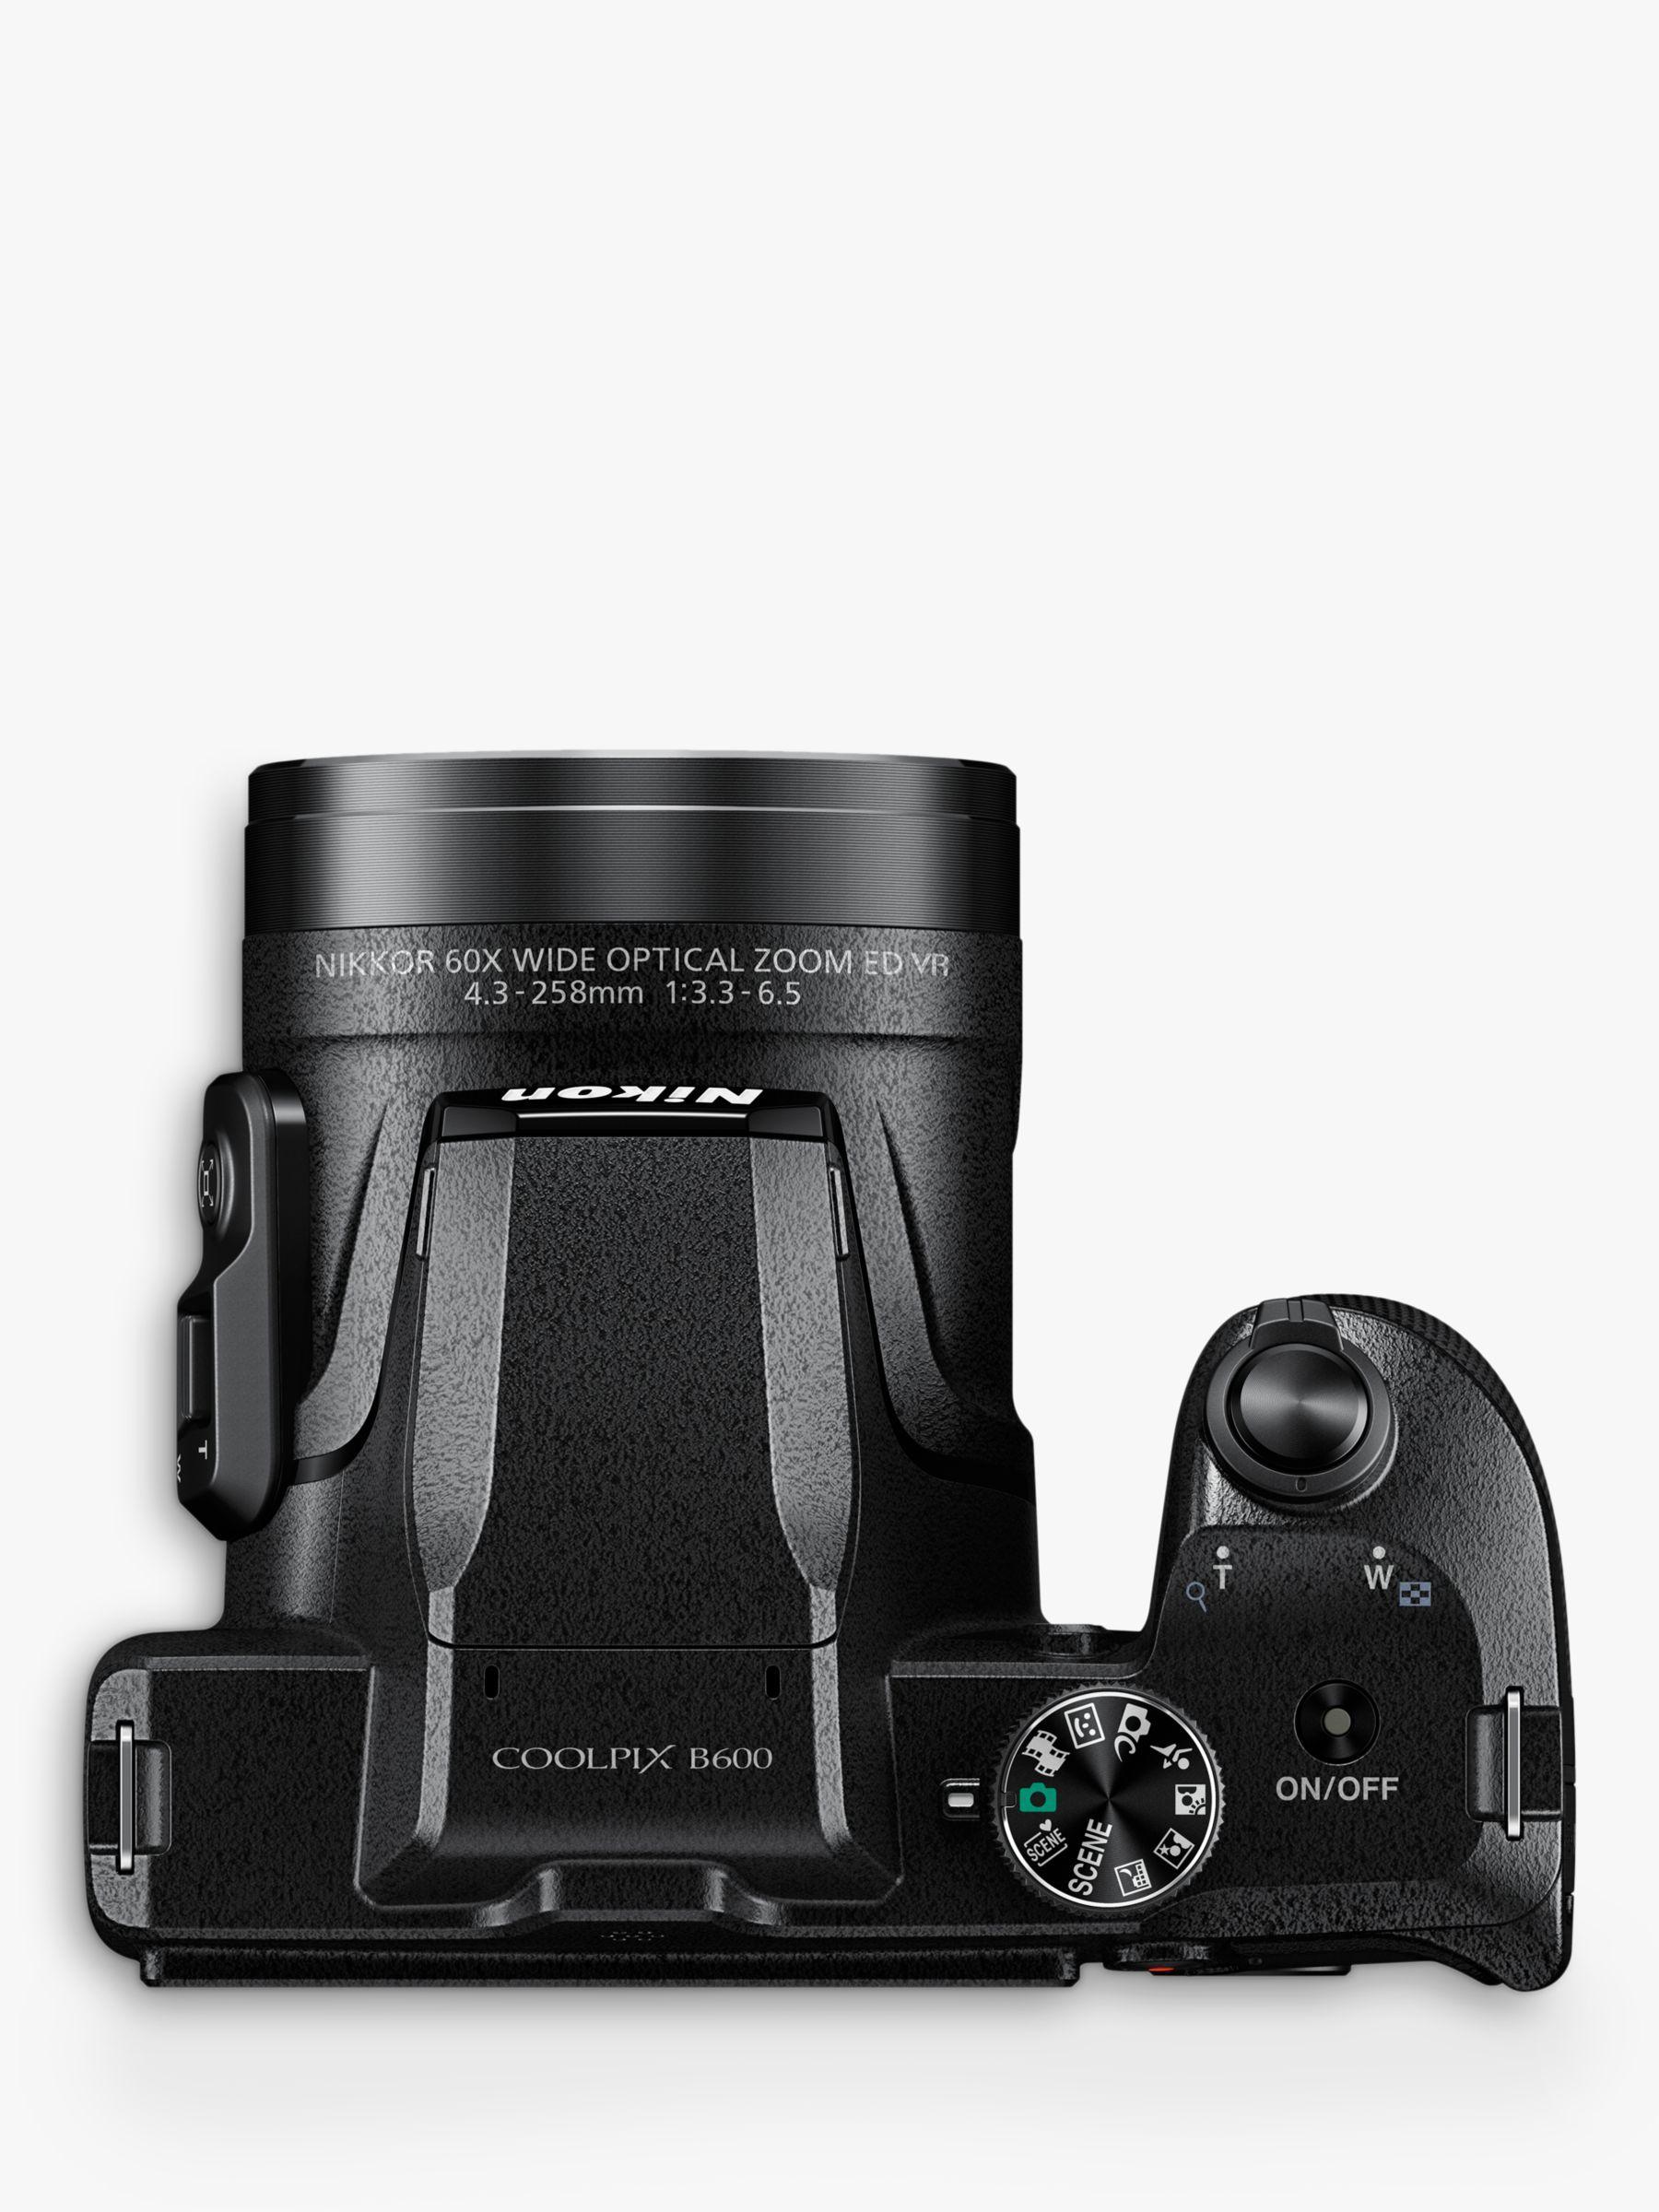 Nikon Coolpix B600 Bridge Camera 16mp Full Hd 60x Optical Zoom